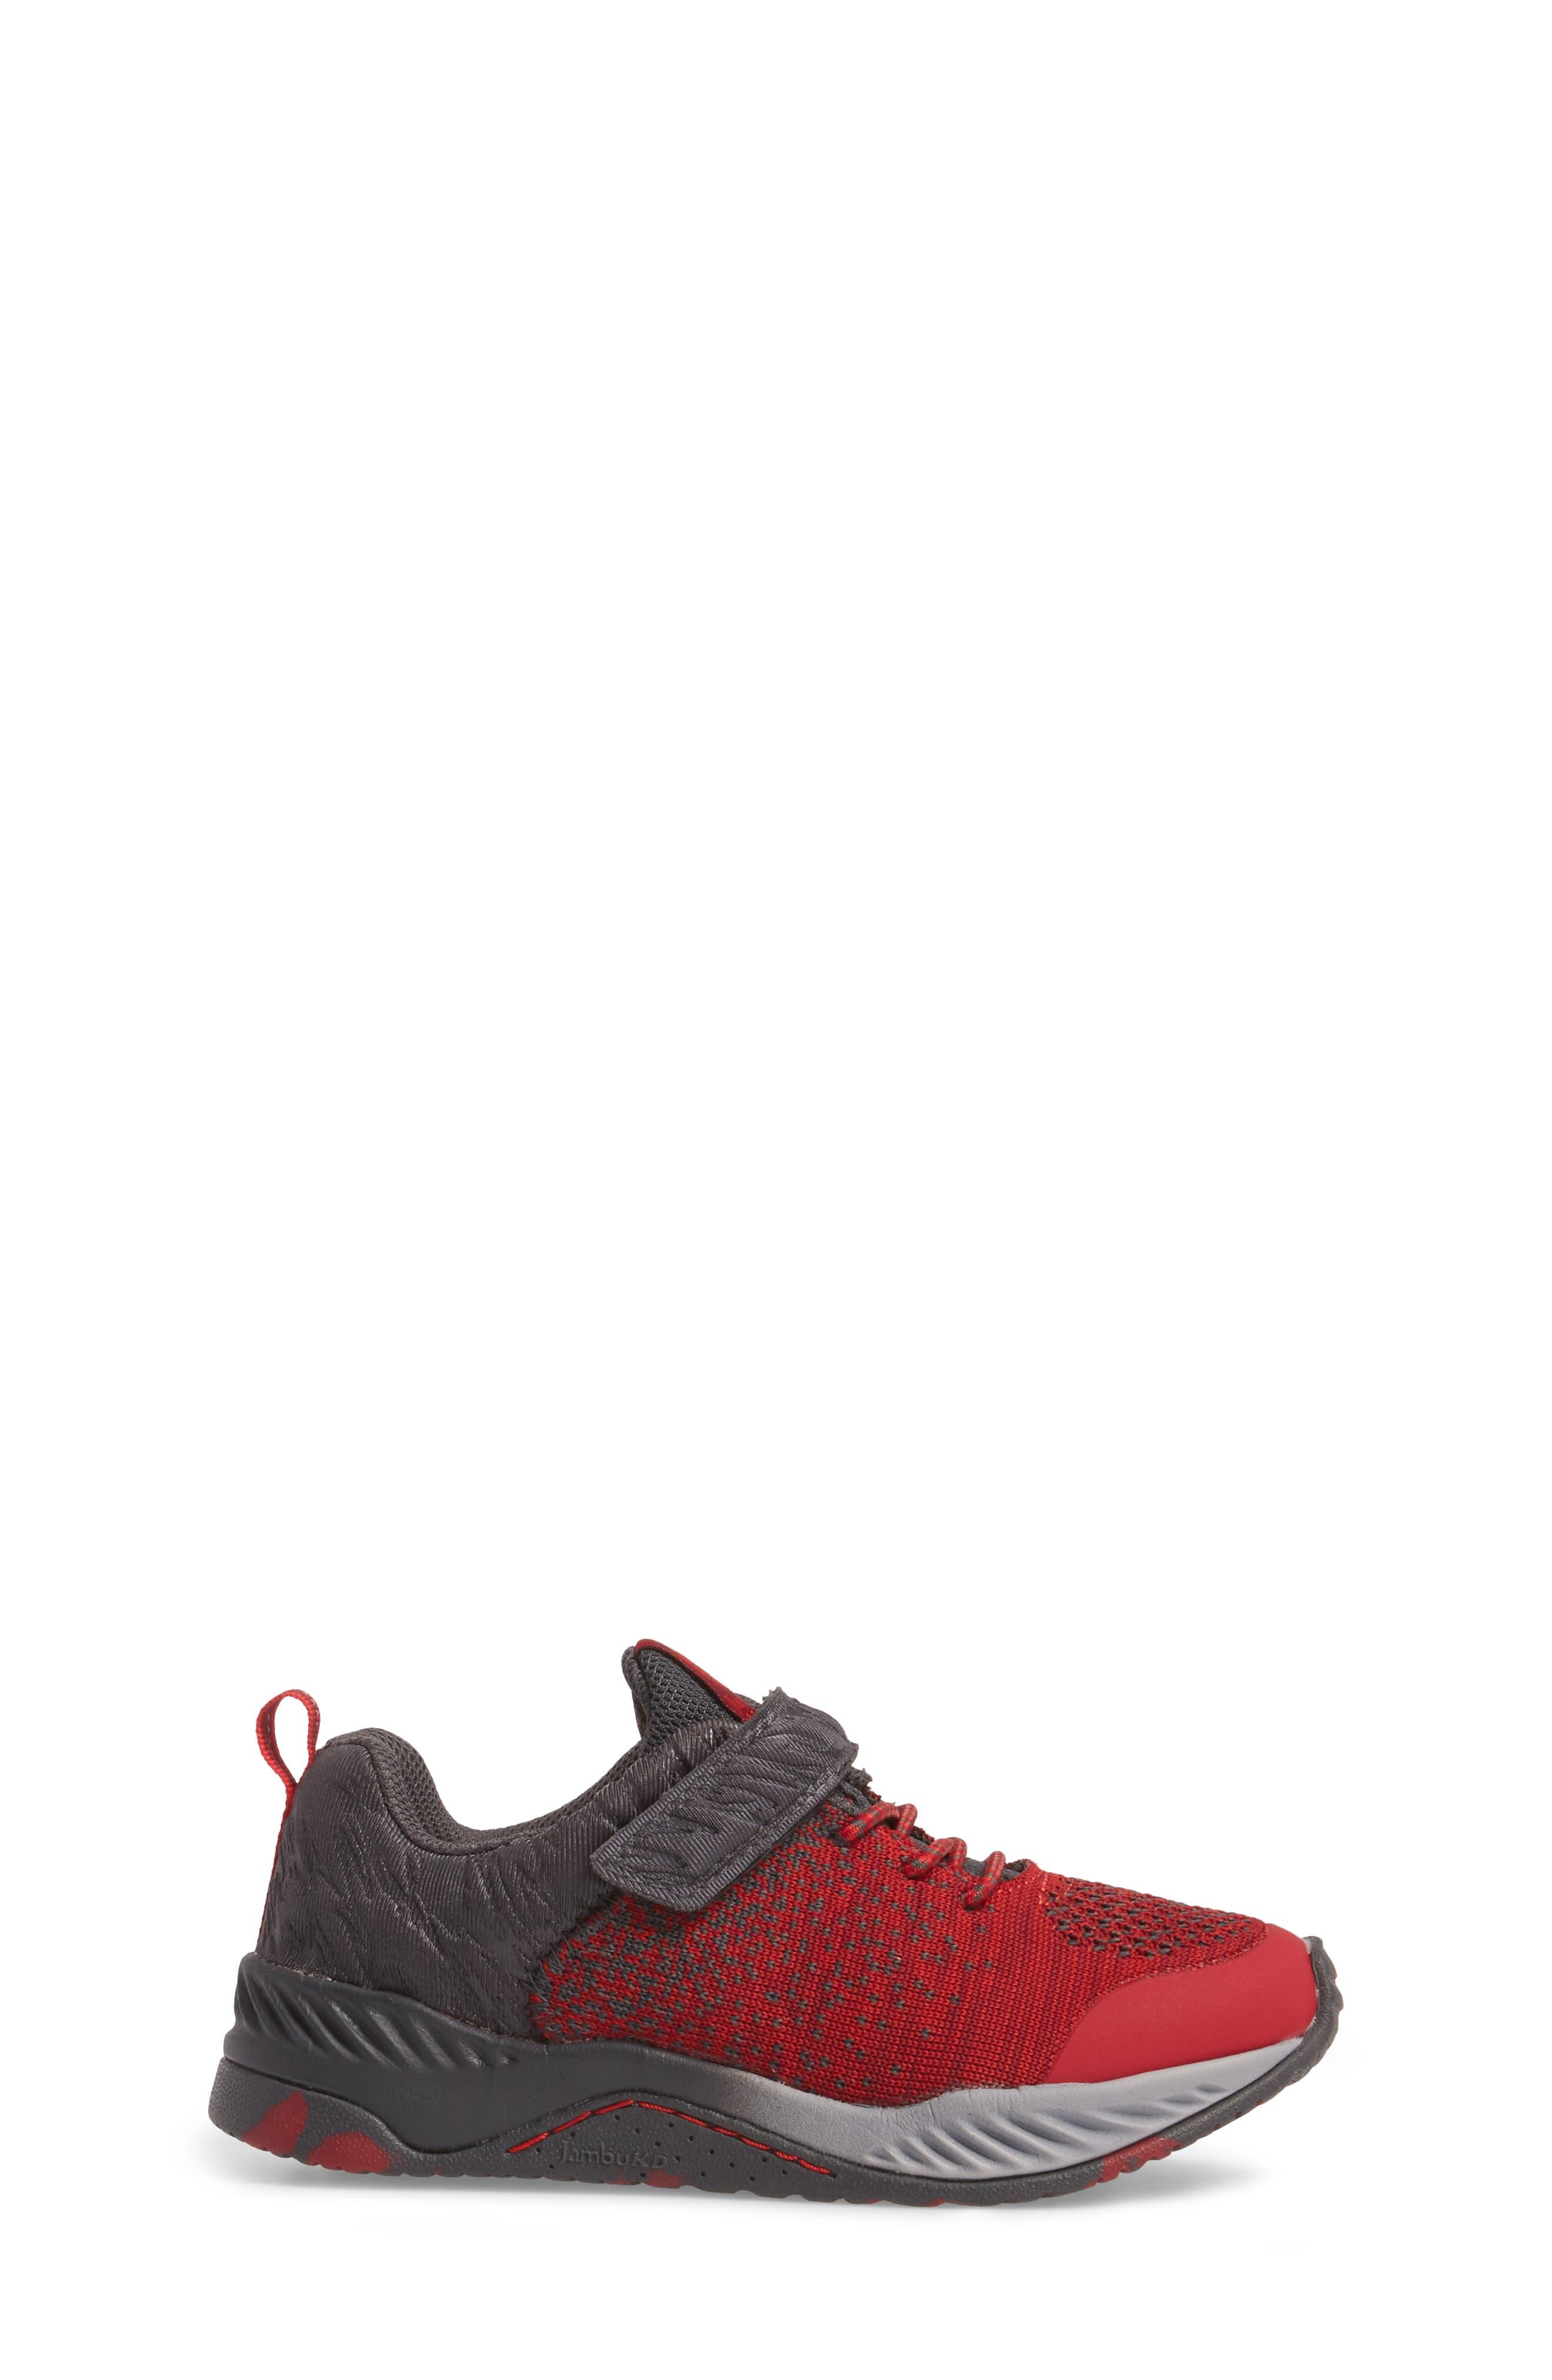 Alternate Image 3  - Jambu Talon Knit Sneaker (Toddler, Little Kid & Big Kid)